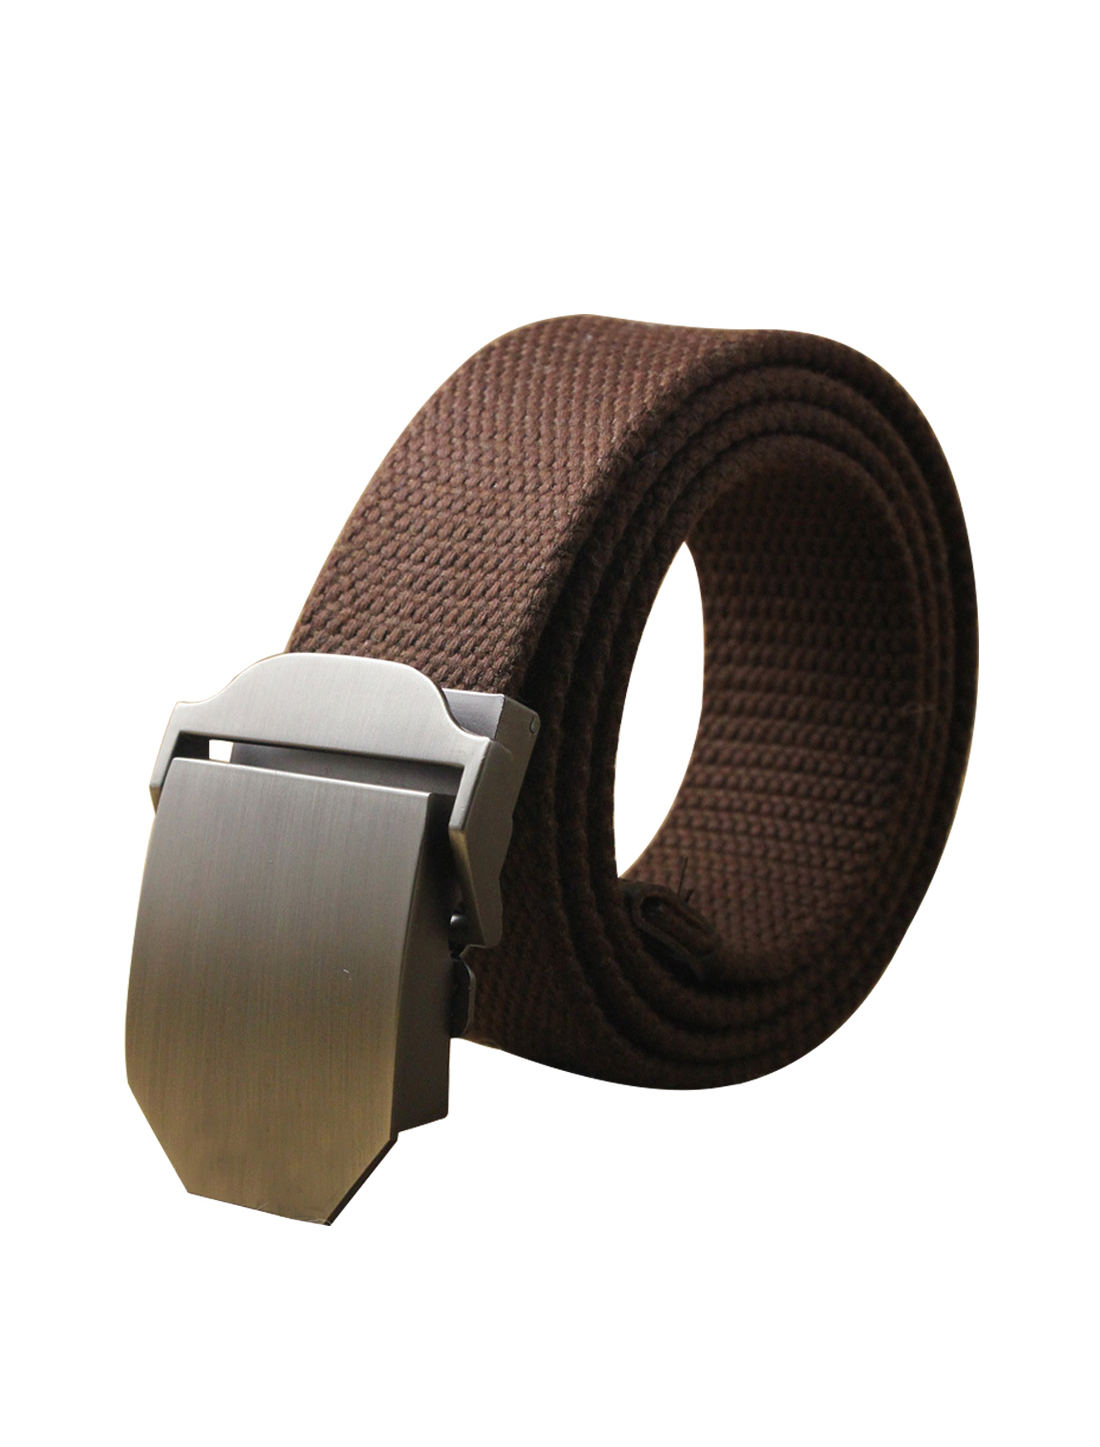 "Men Canvas Automatic Buckle Adjustable Holeless Belt Width 1 1/2"" Coffee"